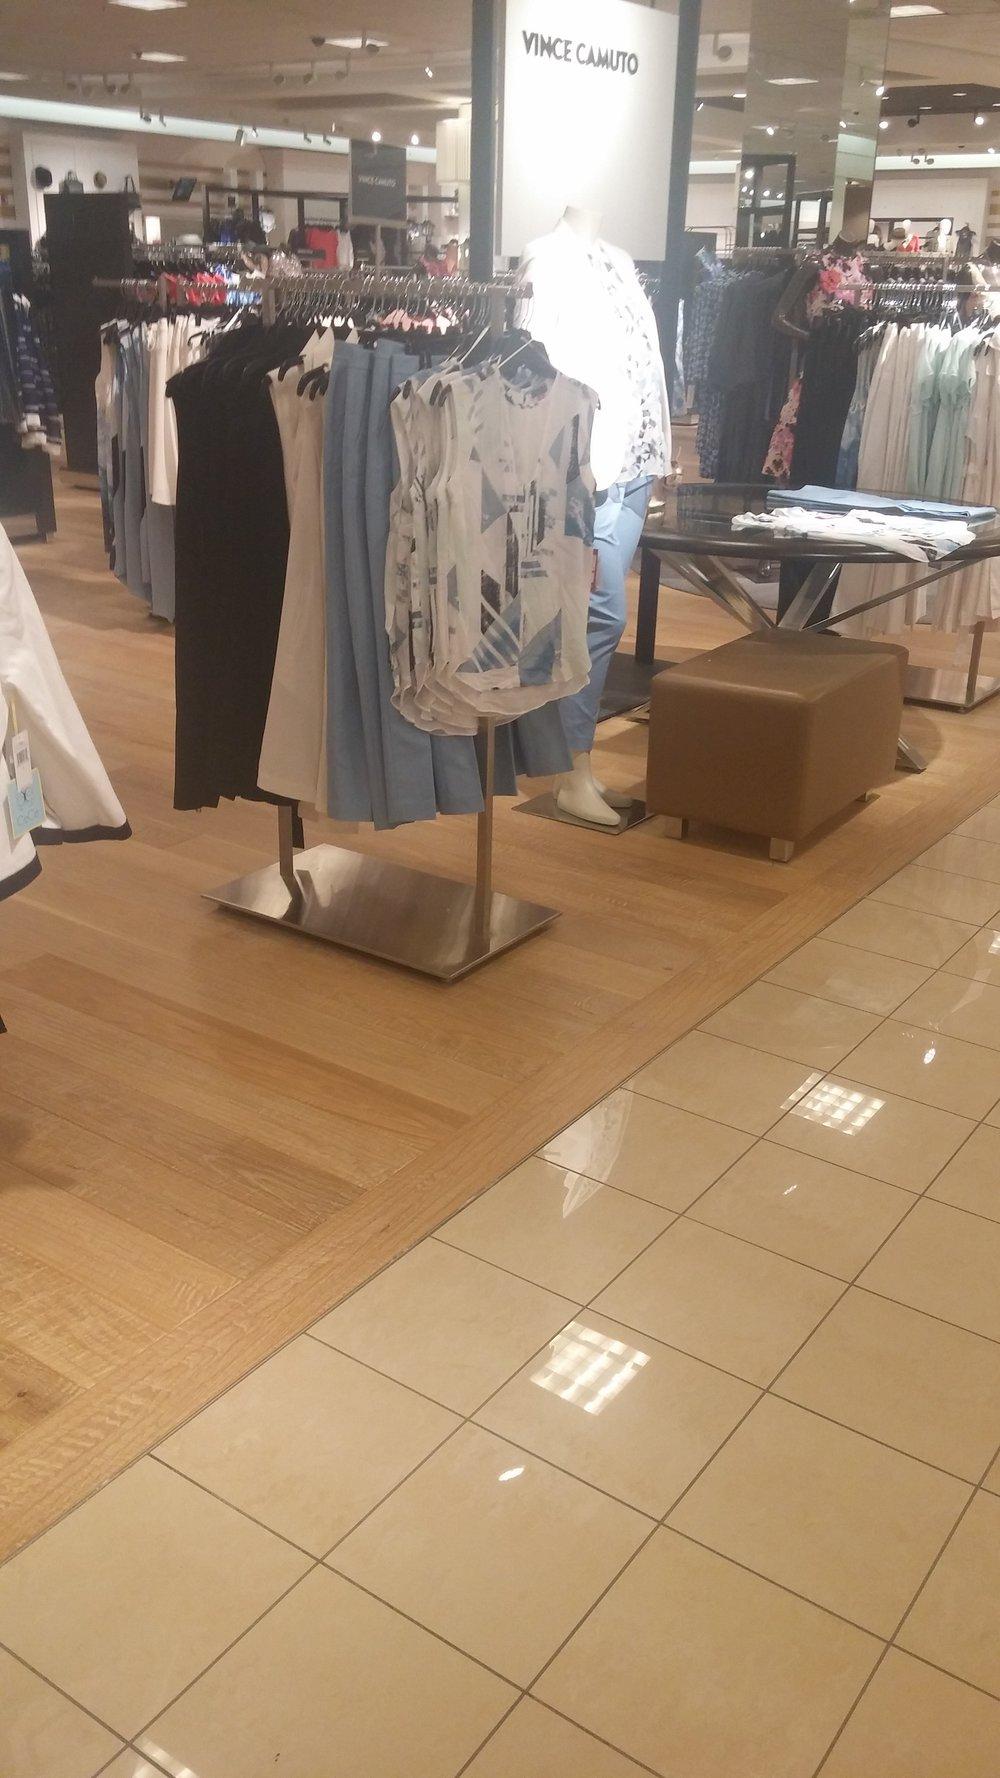 Major Retail-0016.jpg